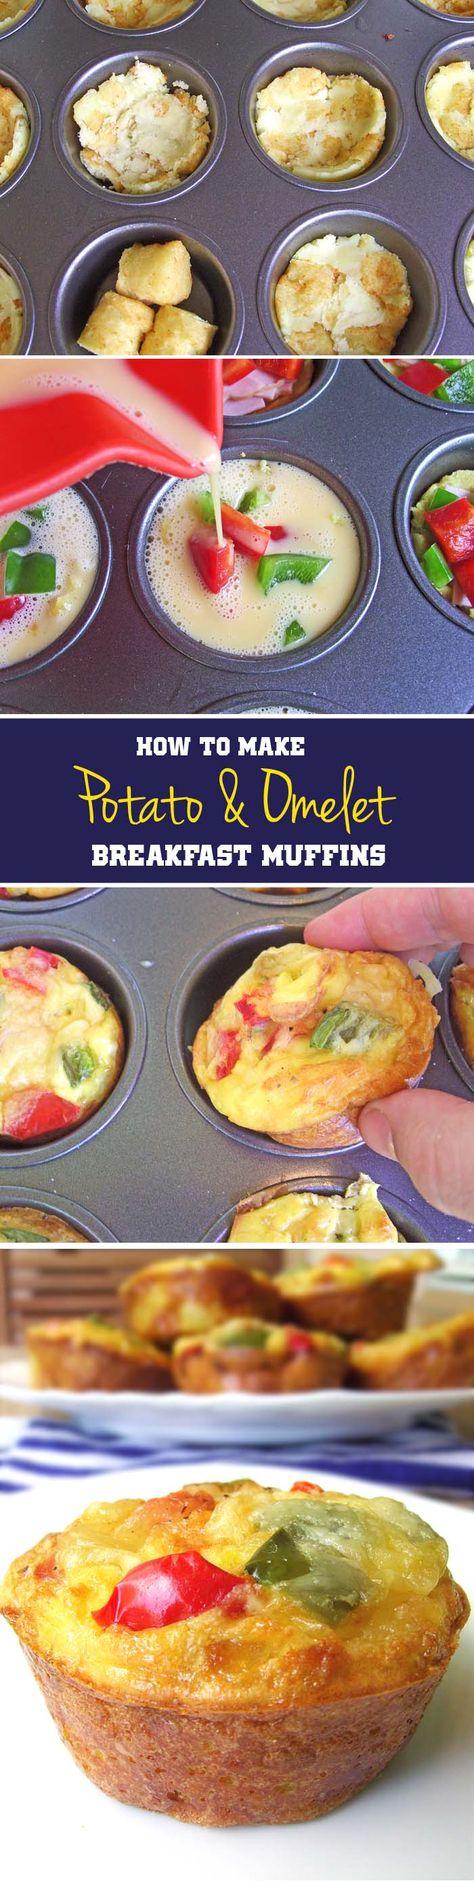 Potato & Omelet Breakfast Muffins - Cakescottage